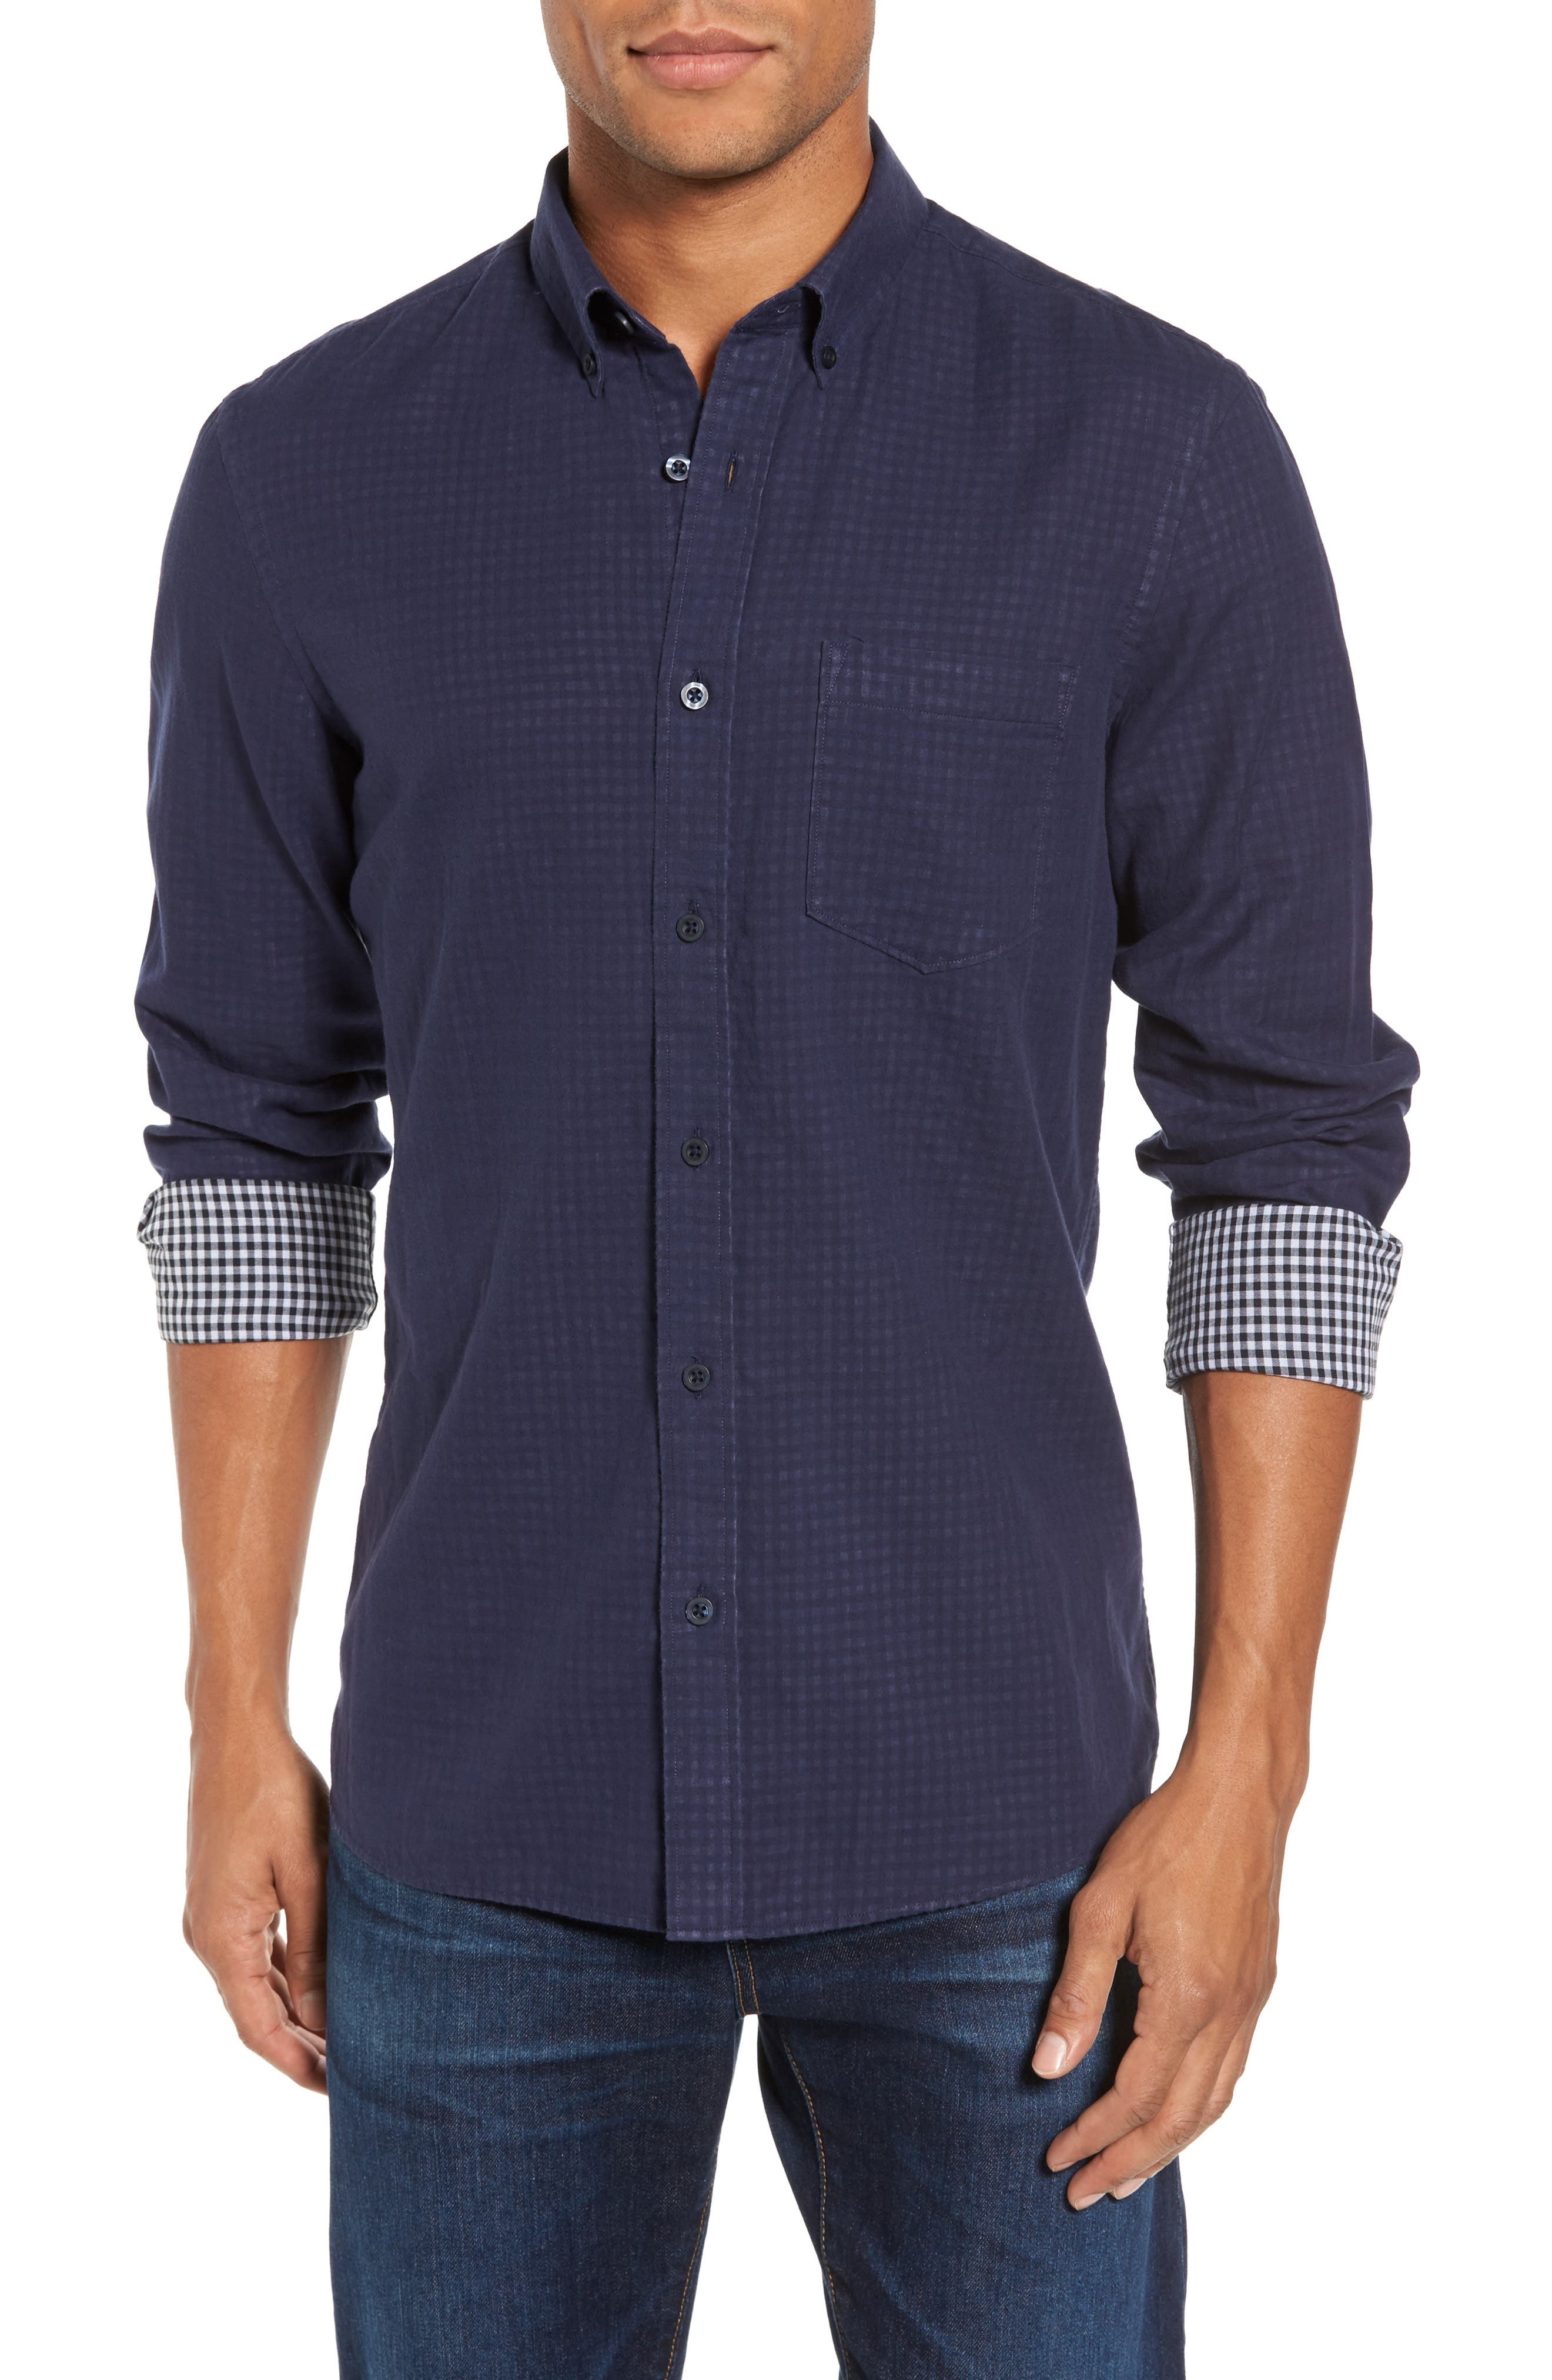 Main Image - Nordstrom Men's Shop Trim Fit Duofold Sport Shirt